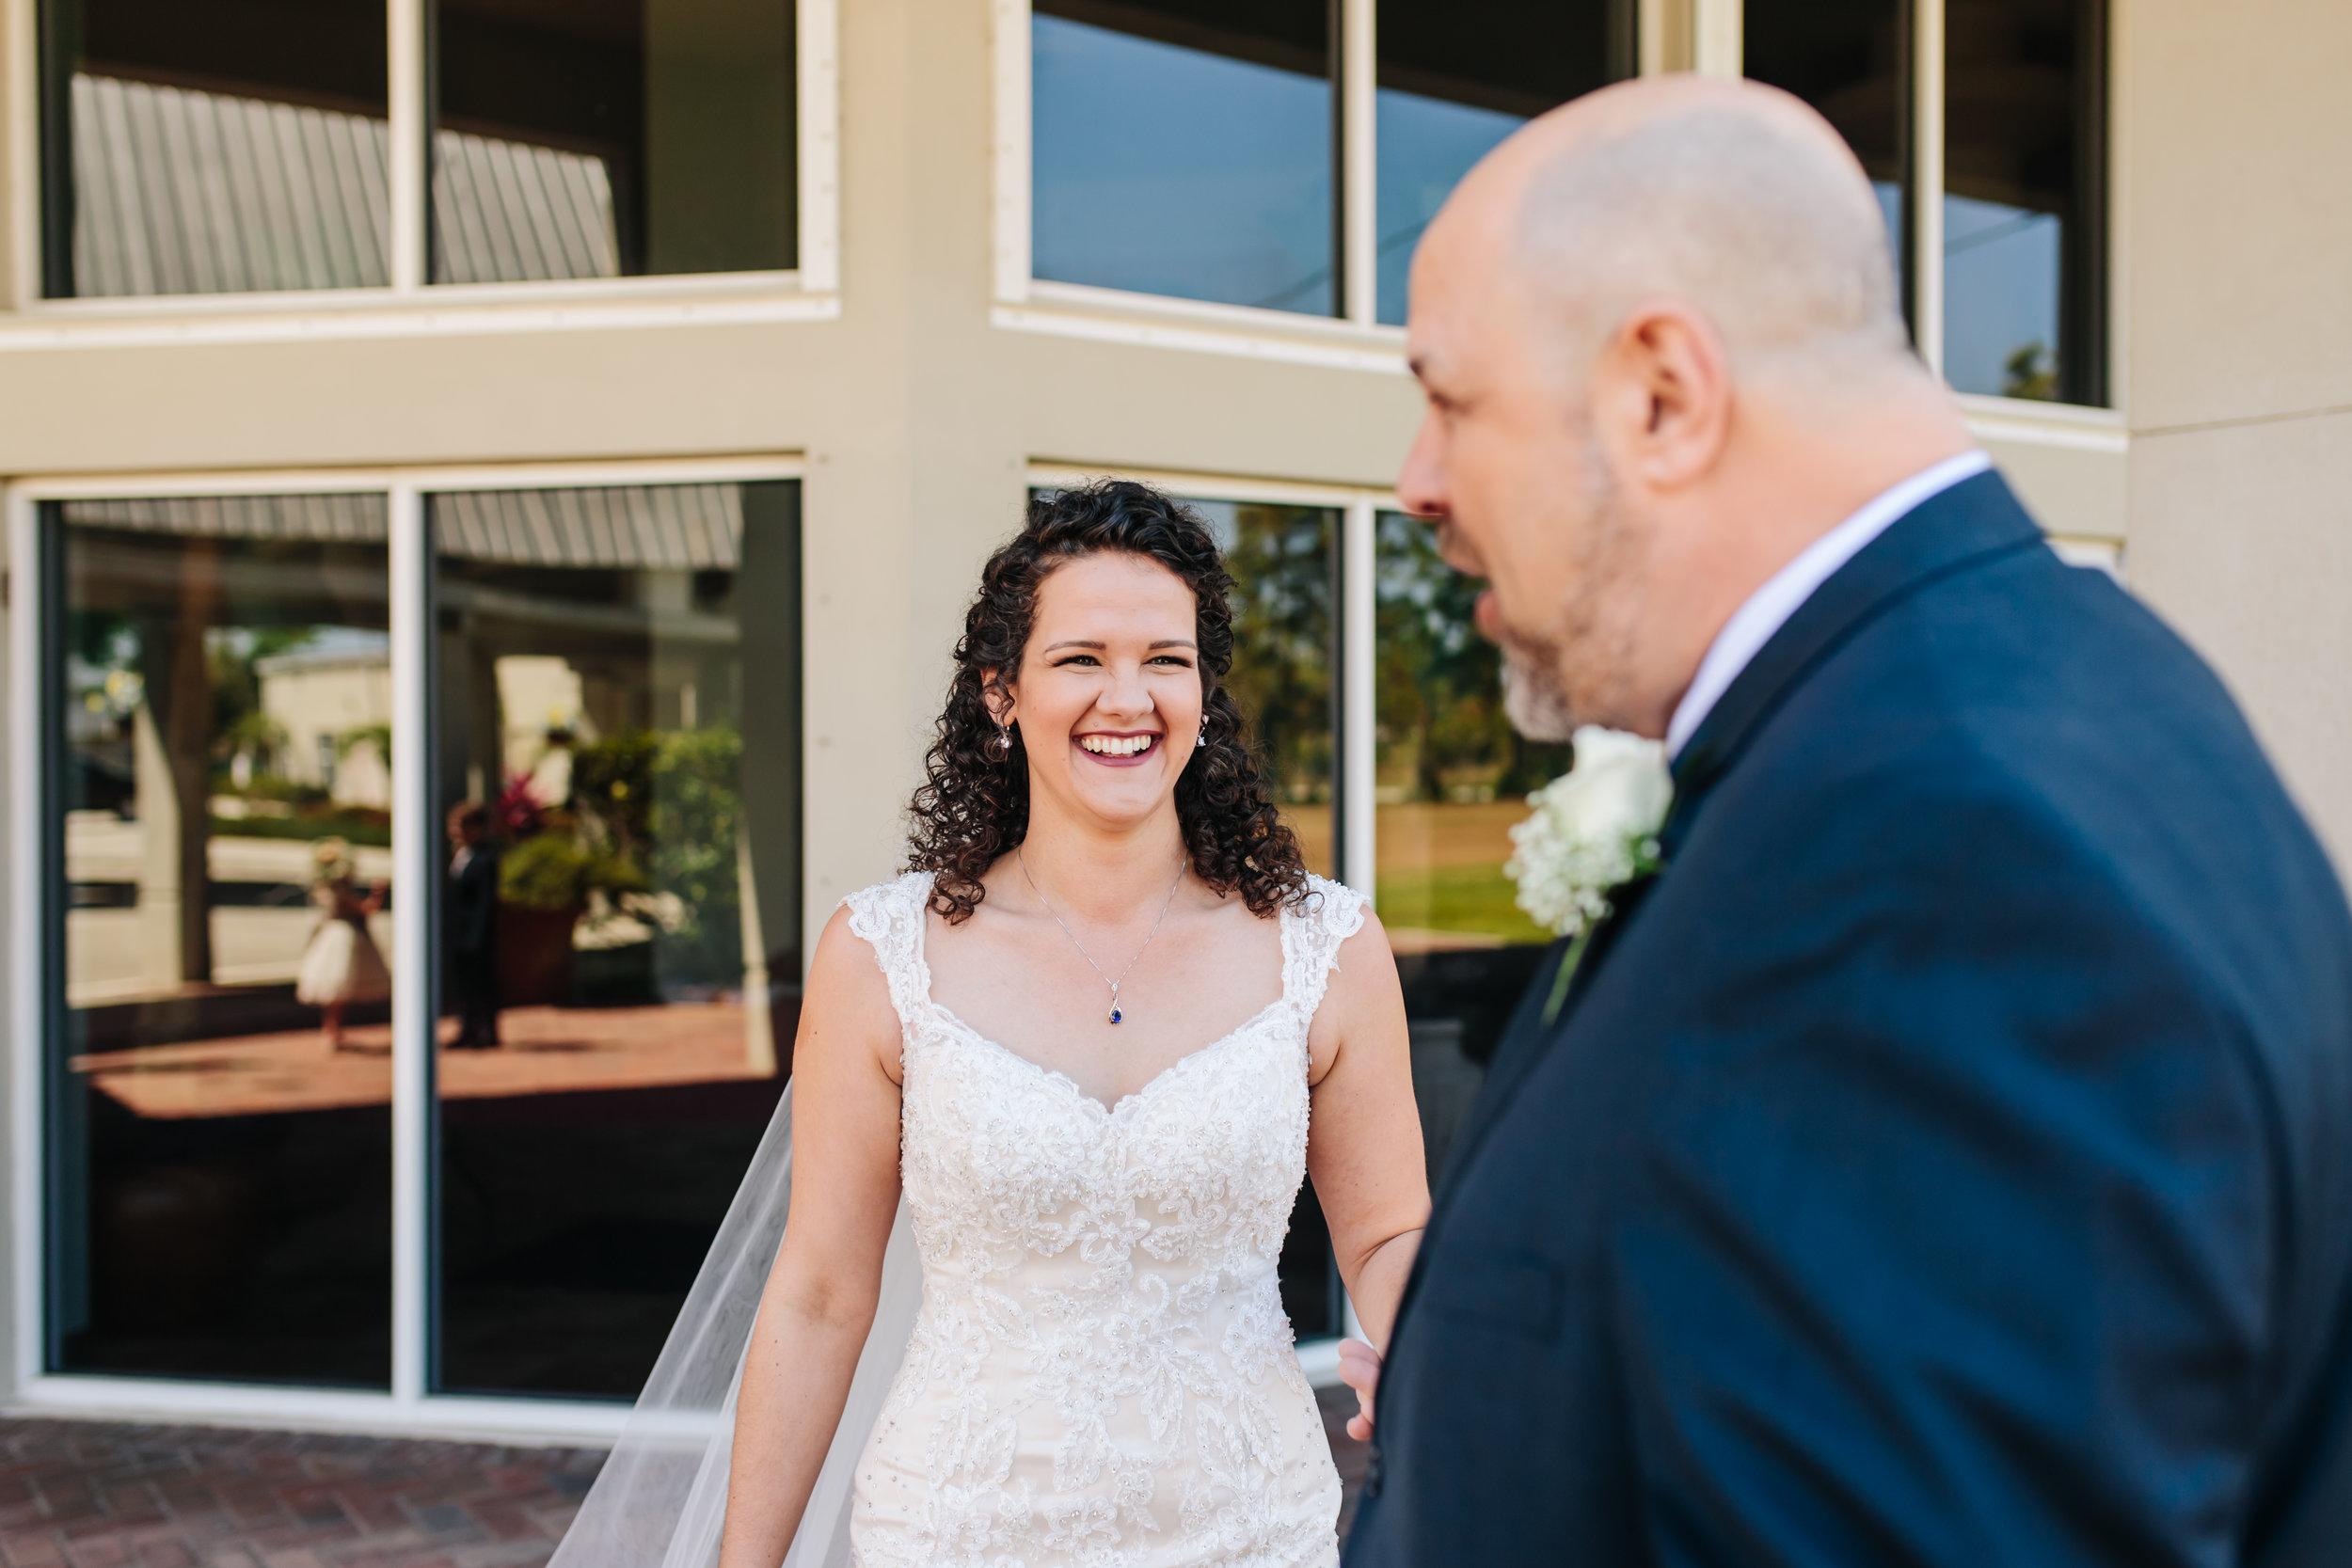 2018.03.17 Allison and Chuck Wedding Waelti Melbourne (86 of 900).jpg